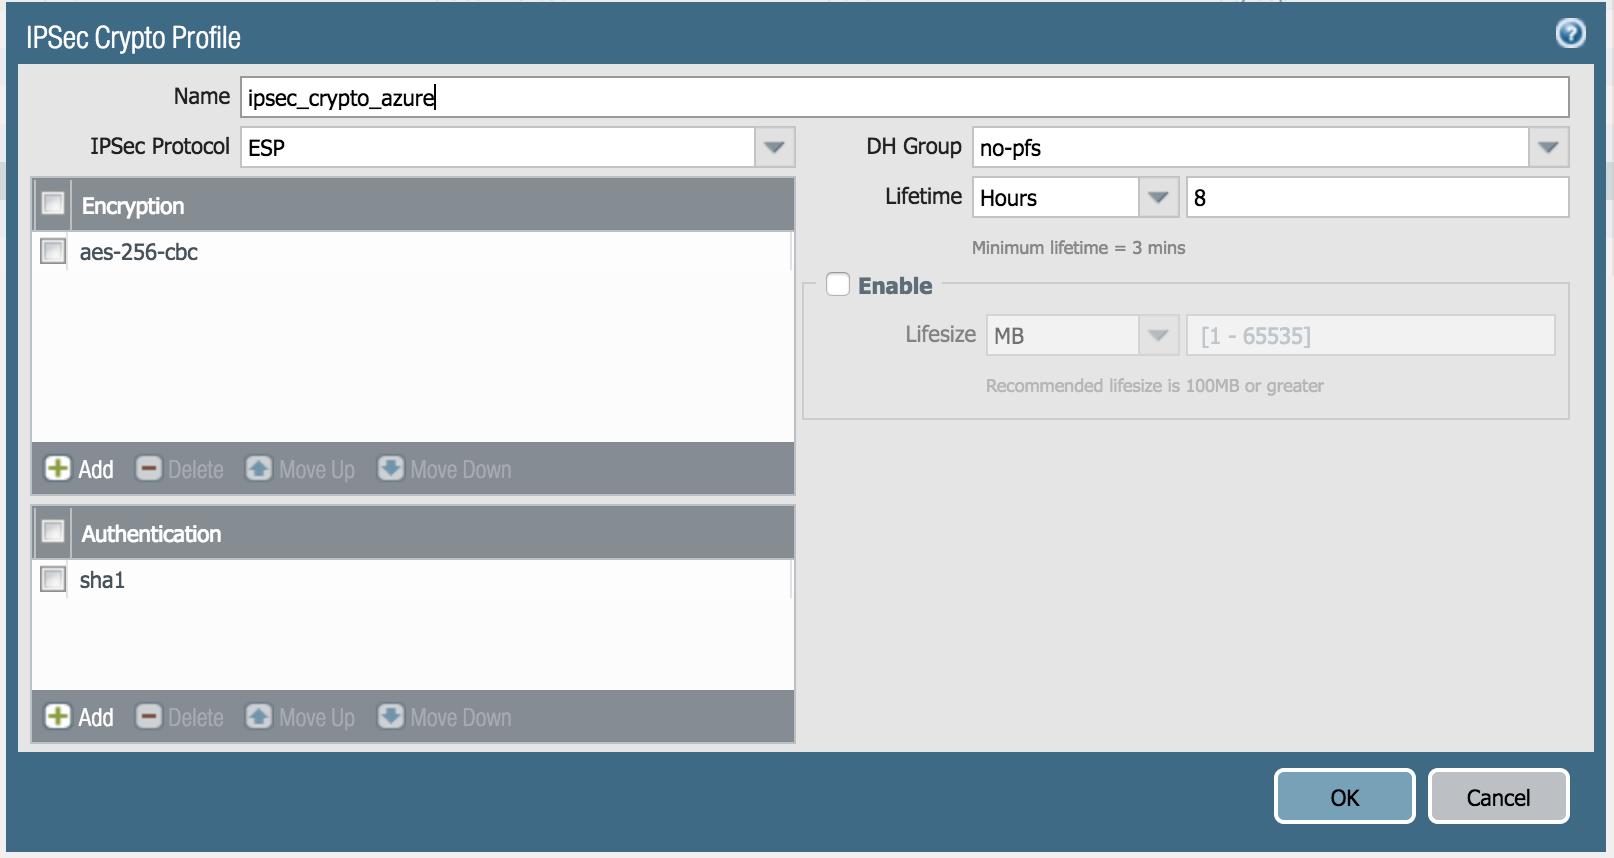 Configuration VPN Palo Alto Networks for Microsoft Azure with VPN